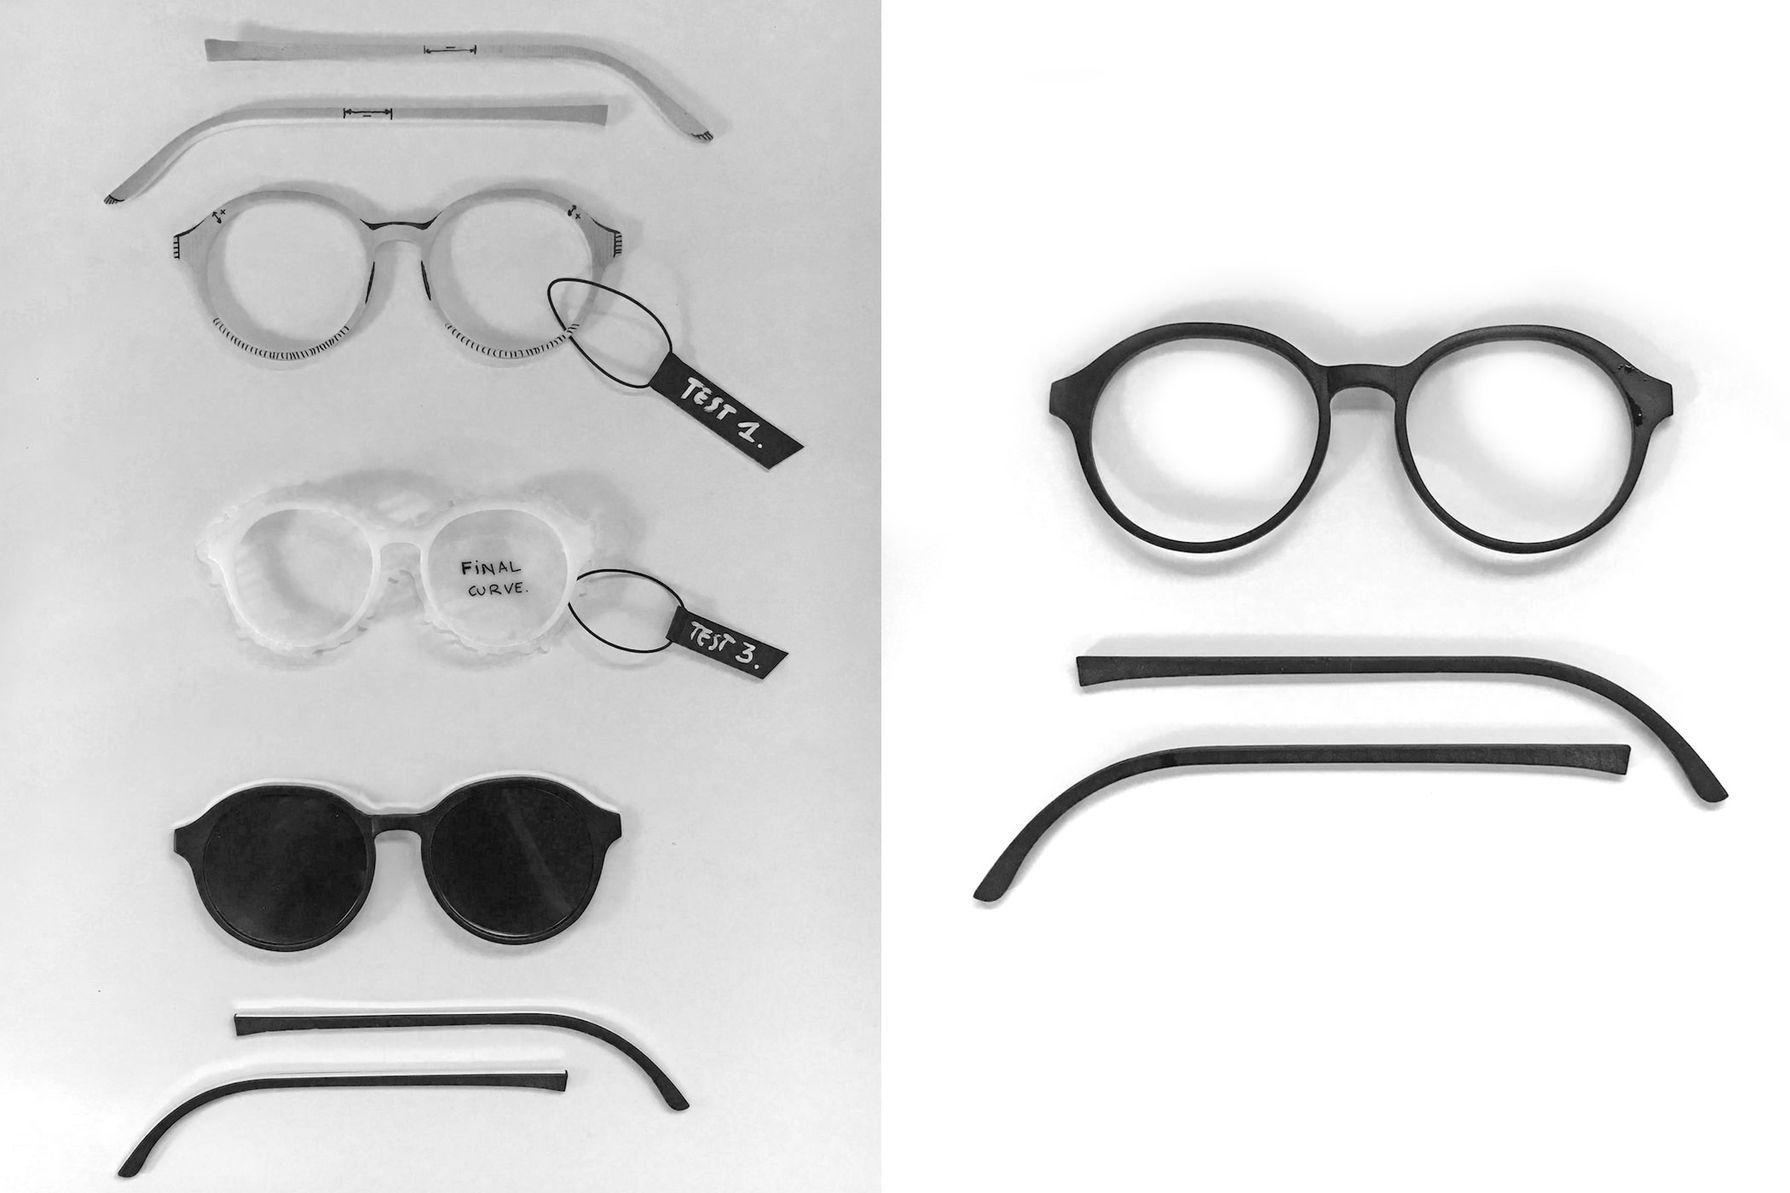 Rapid Prototyping و کاربرد آن با پرینتر سه بعدی 4